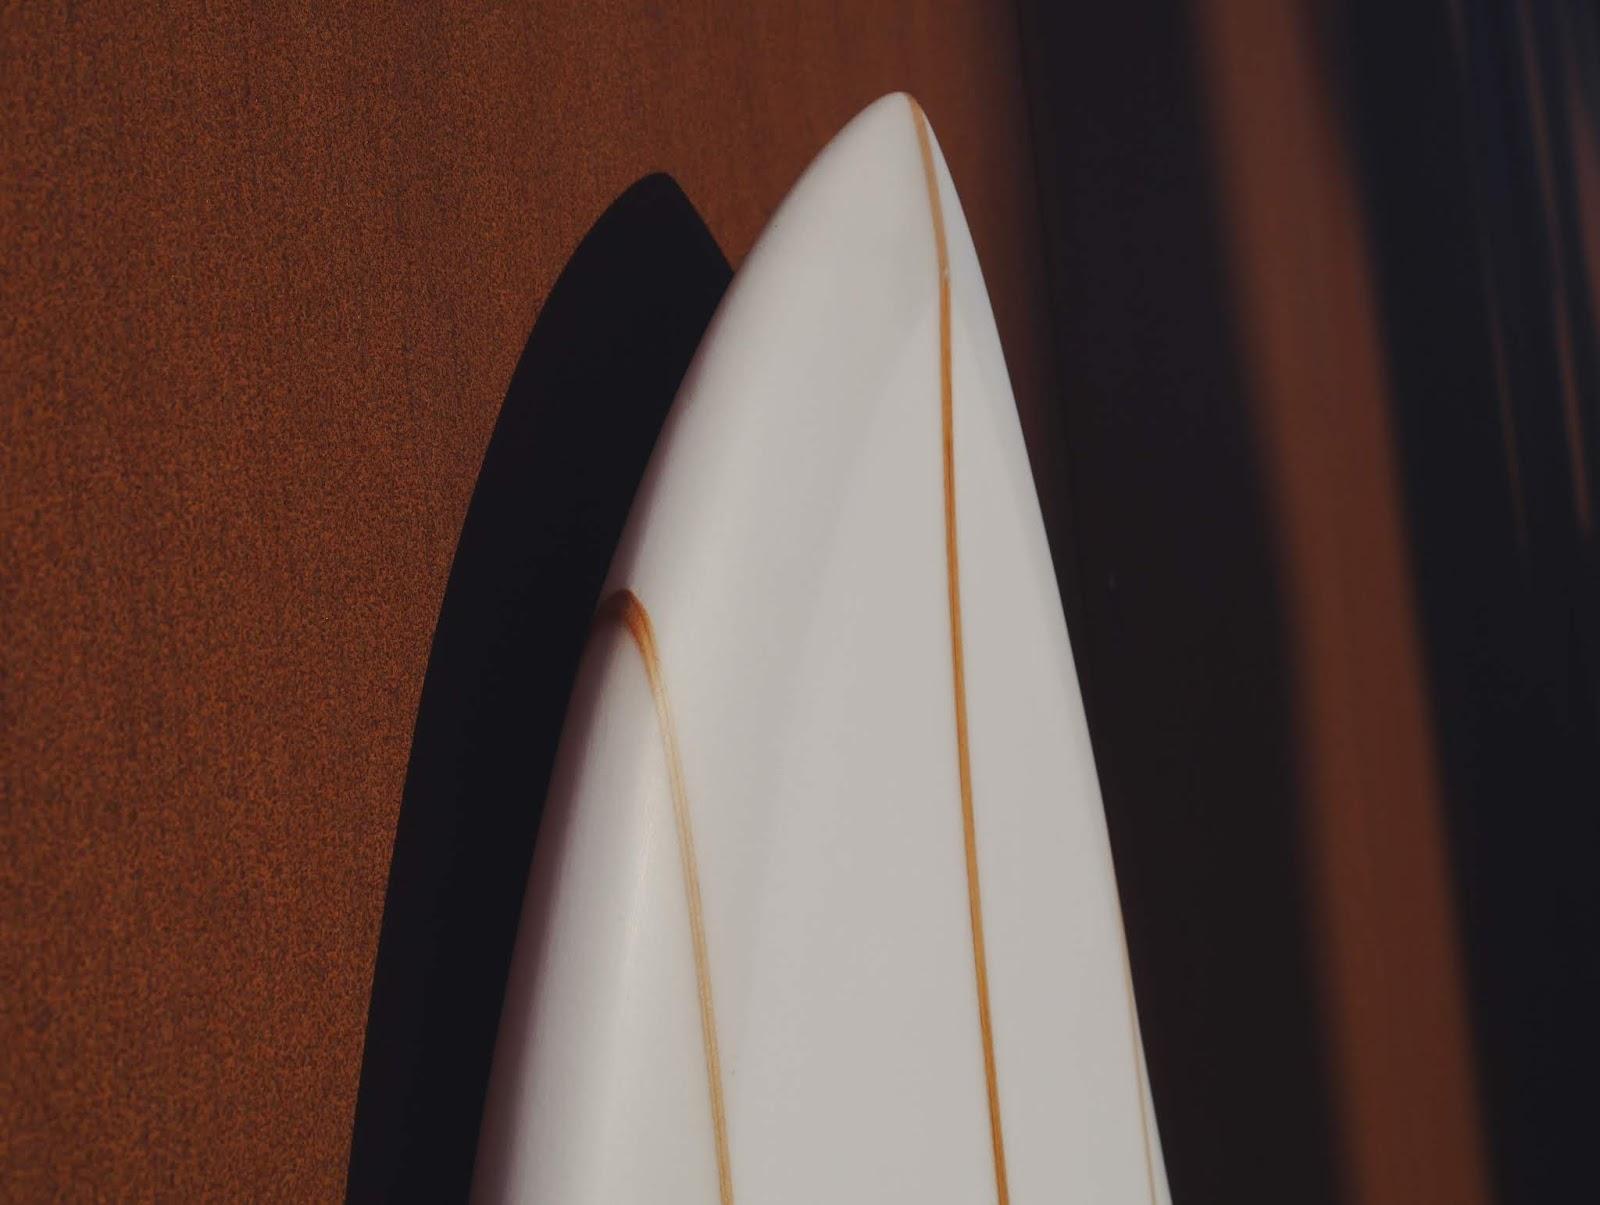 surfinestate surf Hossegor France shop culture Arecibo twinfin channel shape handshape triplestringer usblanks Arthur Nelli Vincent Lemanceau